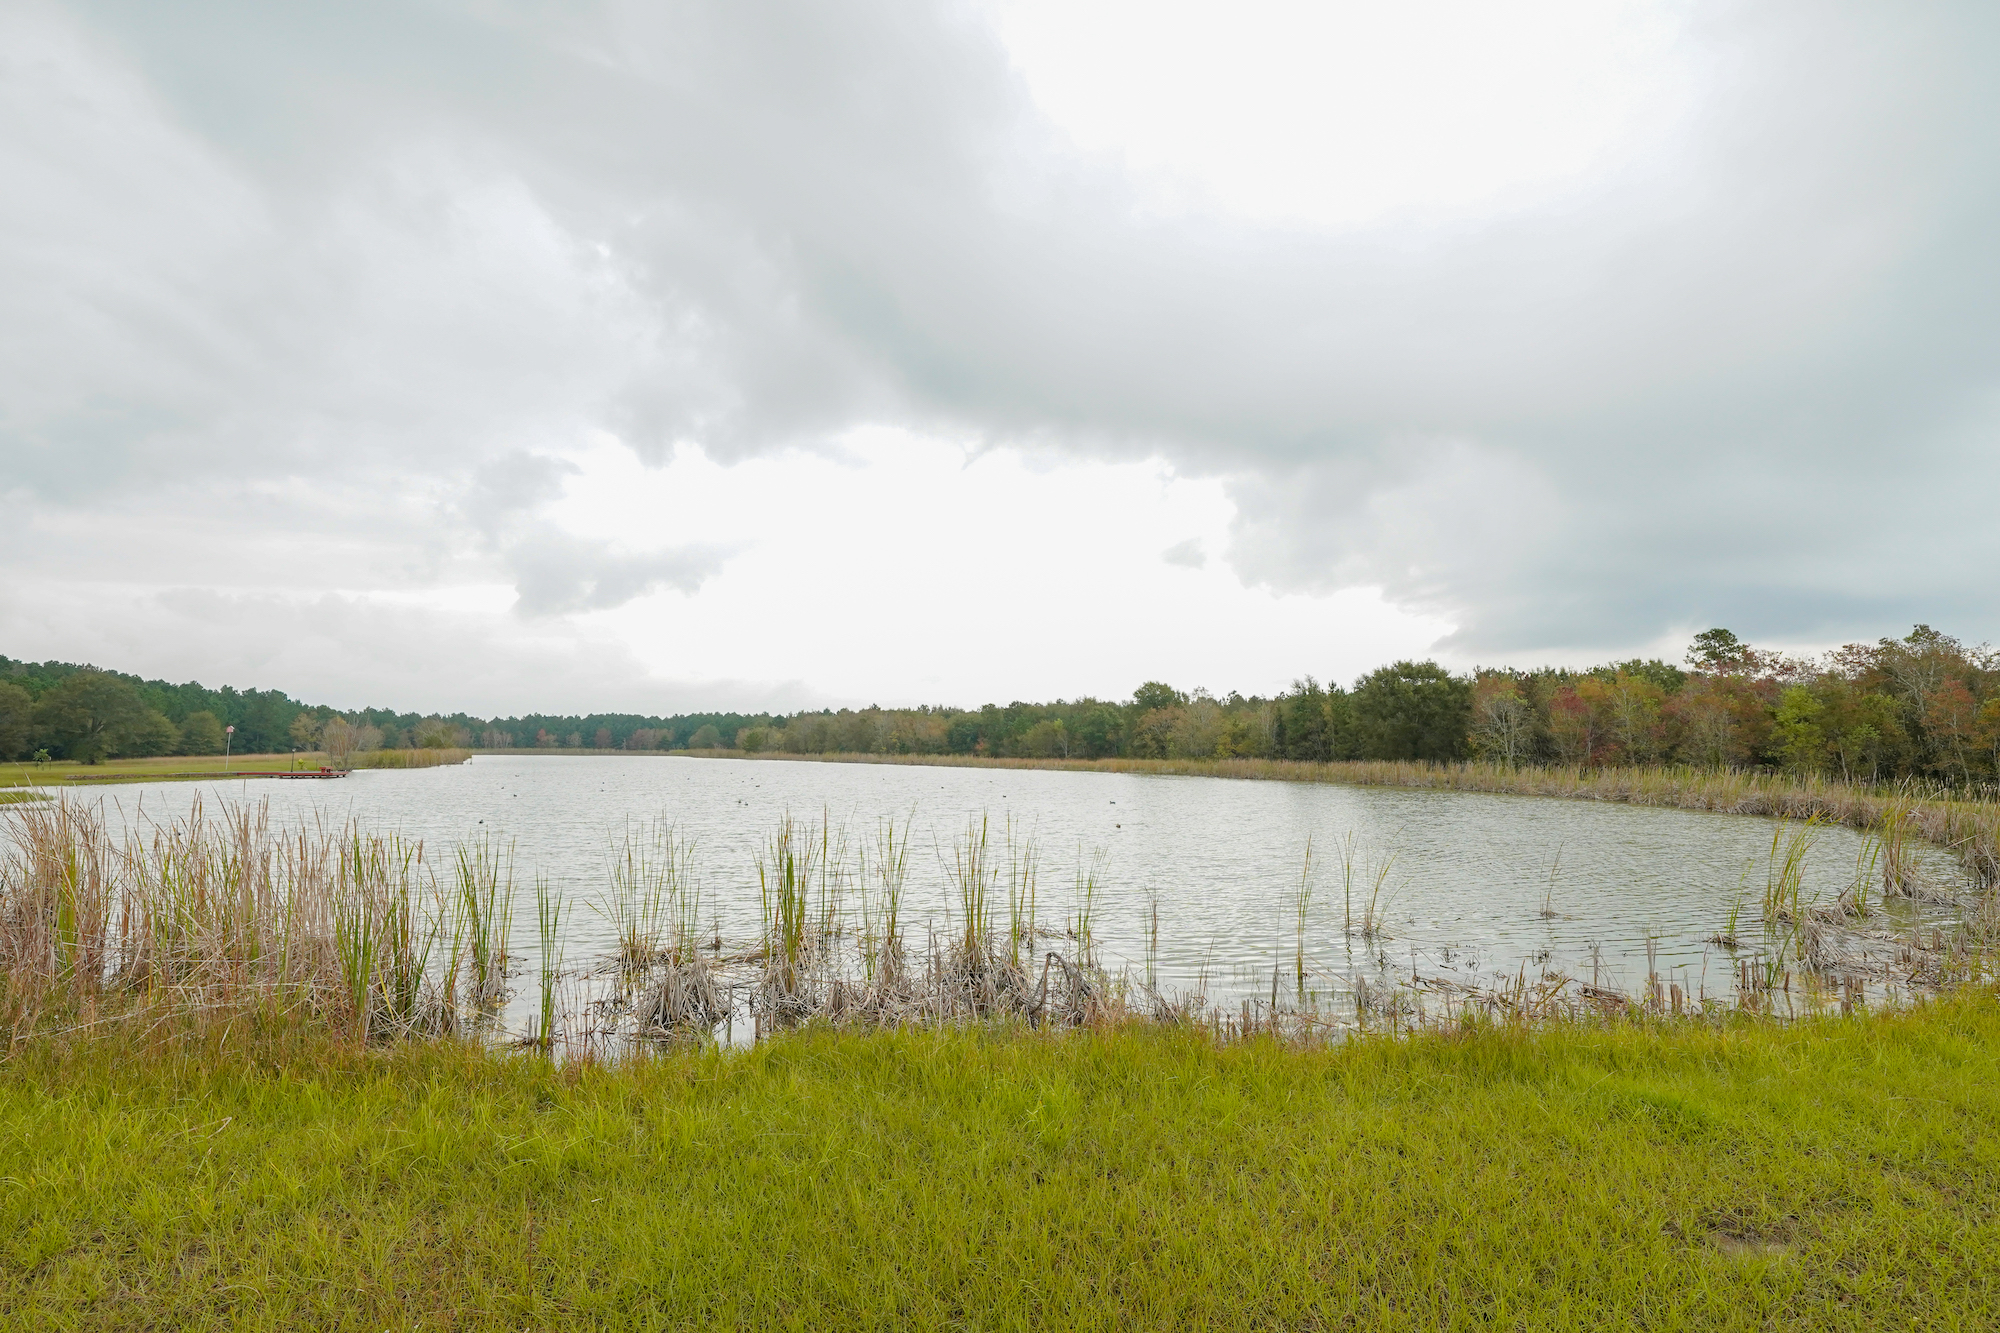 Jefferson County Development Land - Image 15 of 36